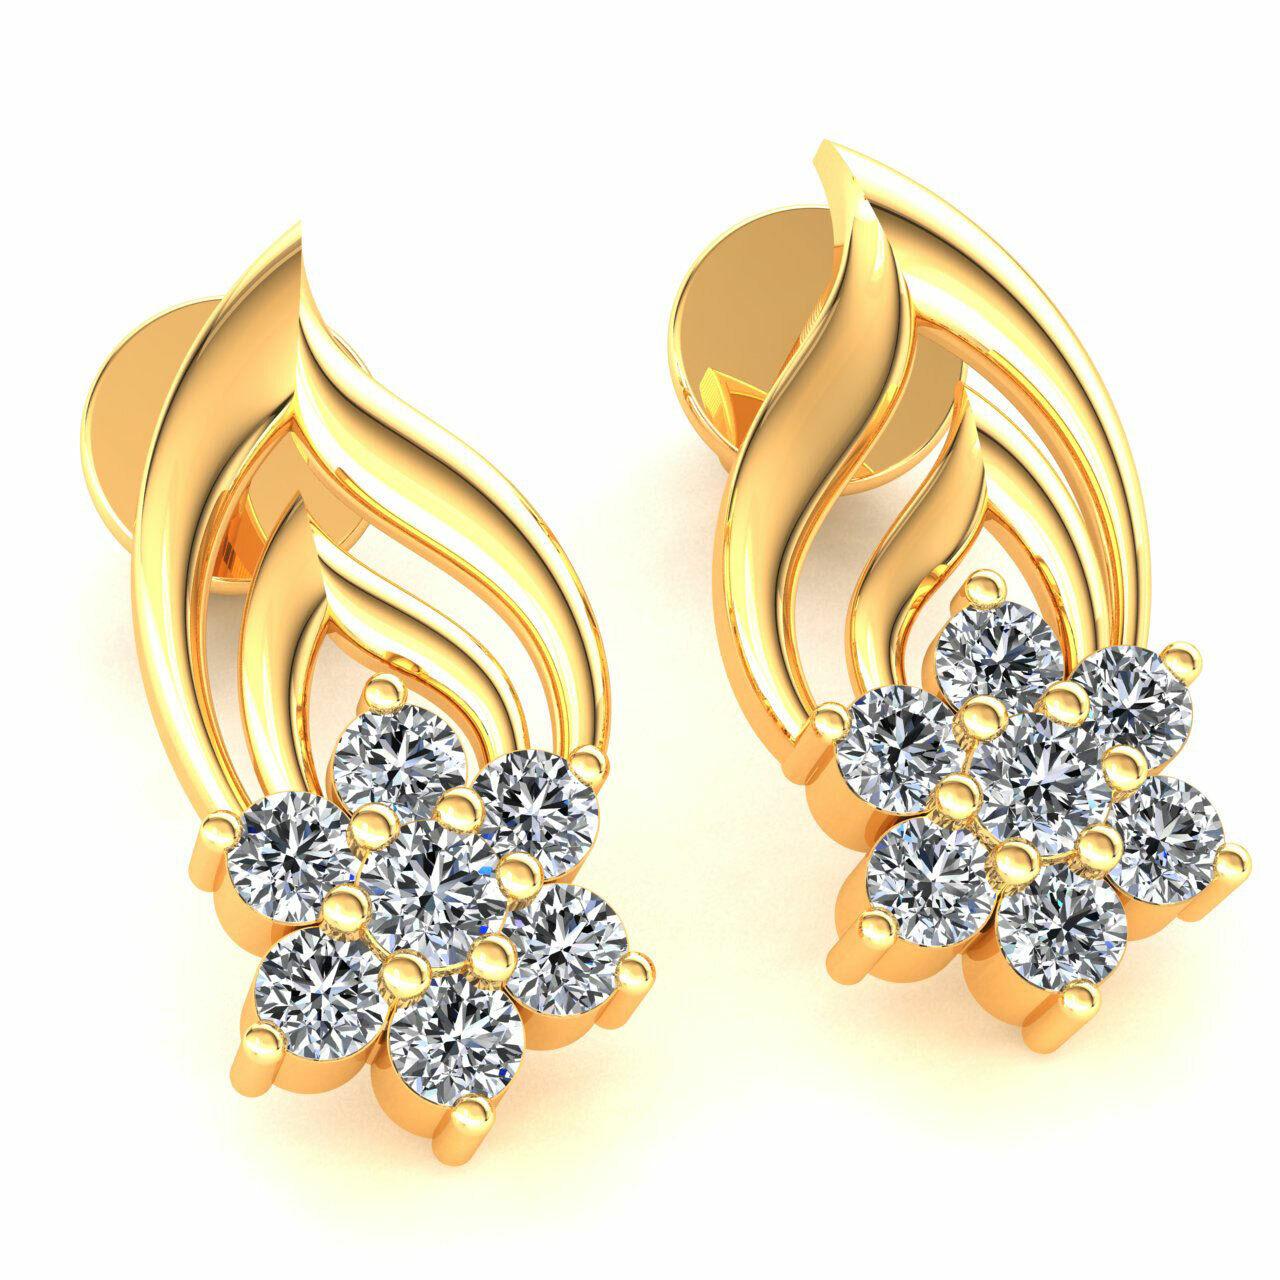 0.4ct Round Cut Not Enhanced Diamond Ladies 7Stone Flower Earrings 18K gold